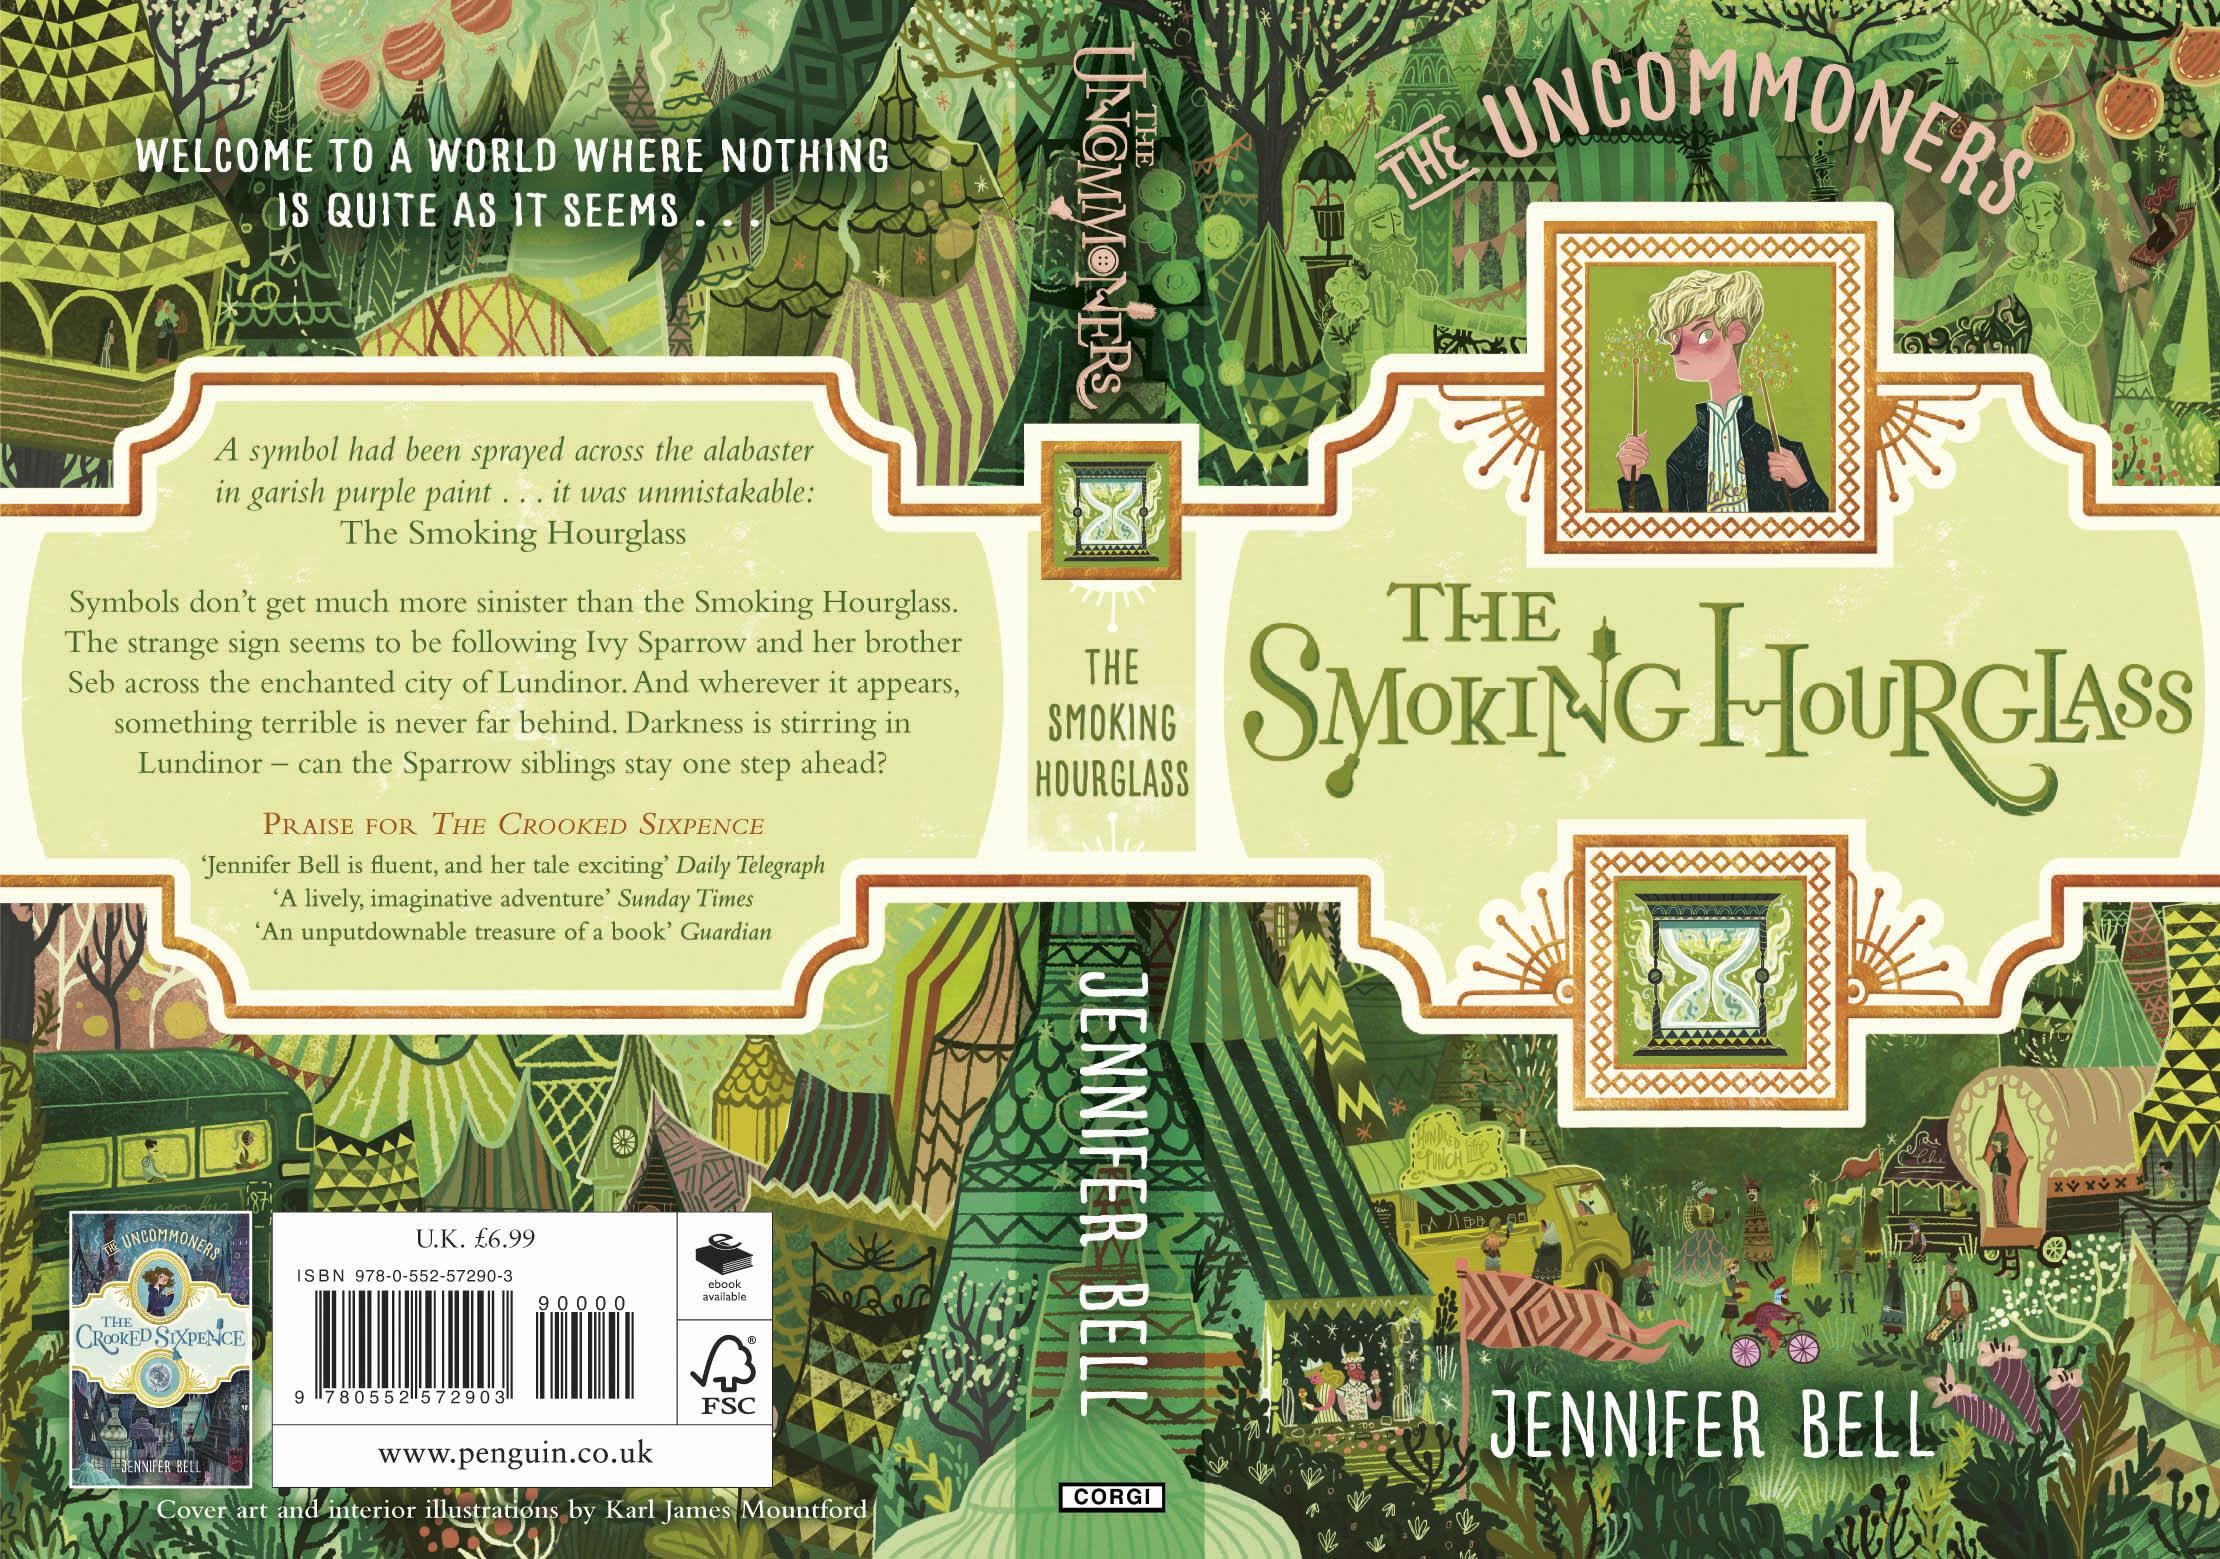 The Smoking Hourglass Greenhouse Literary Agency